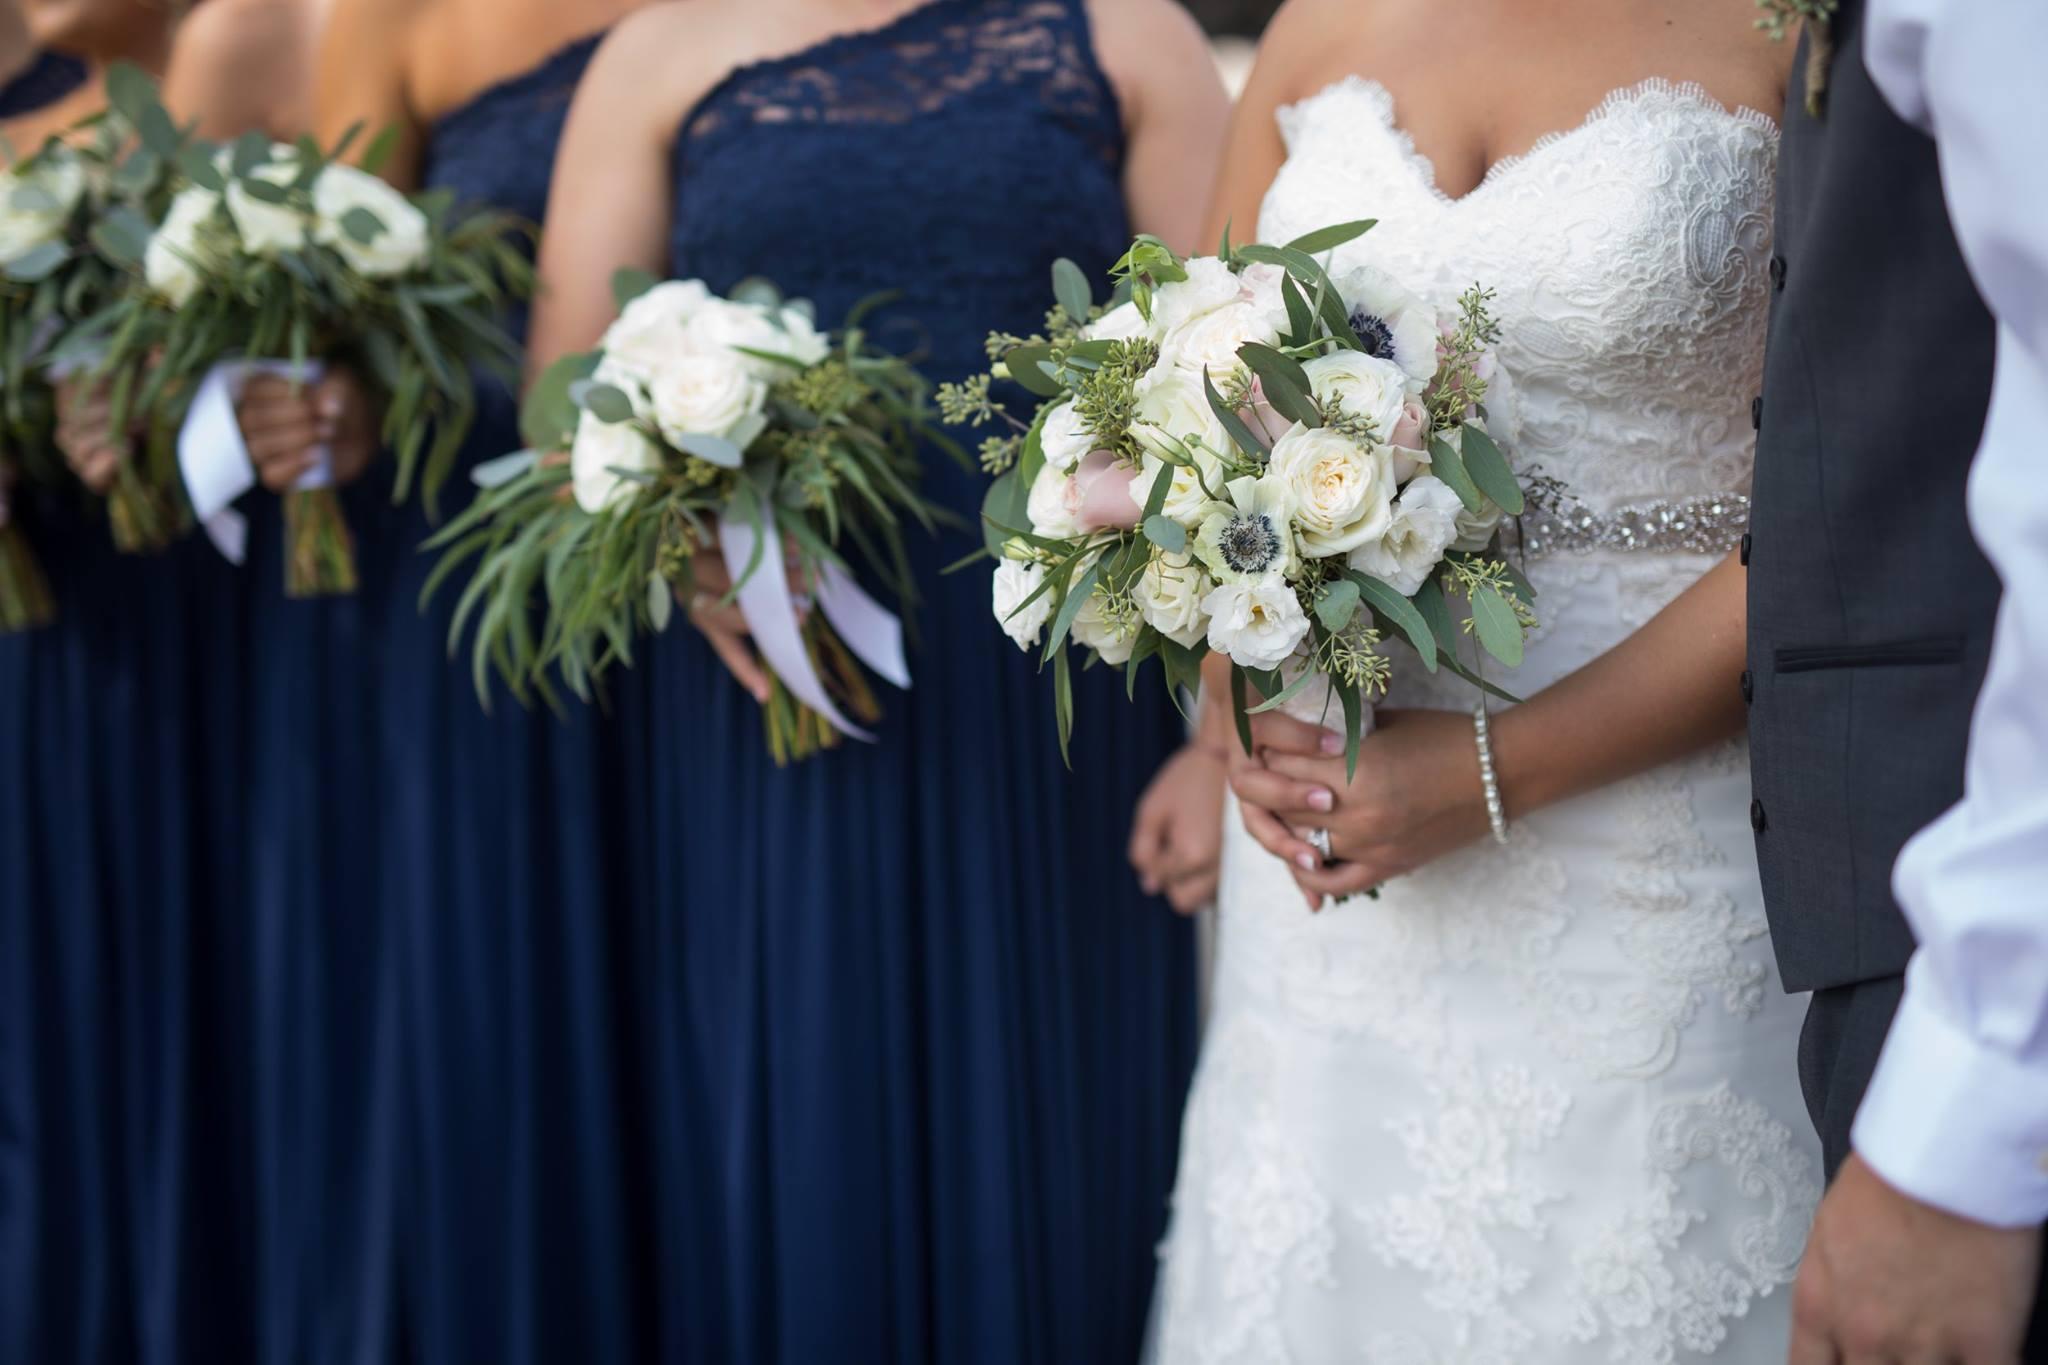 Event & Wedding Services